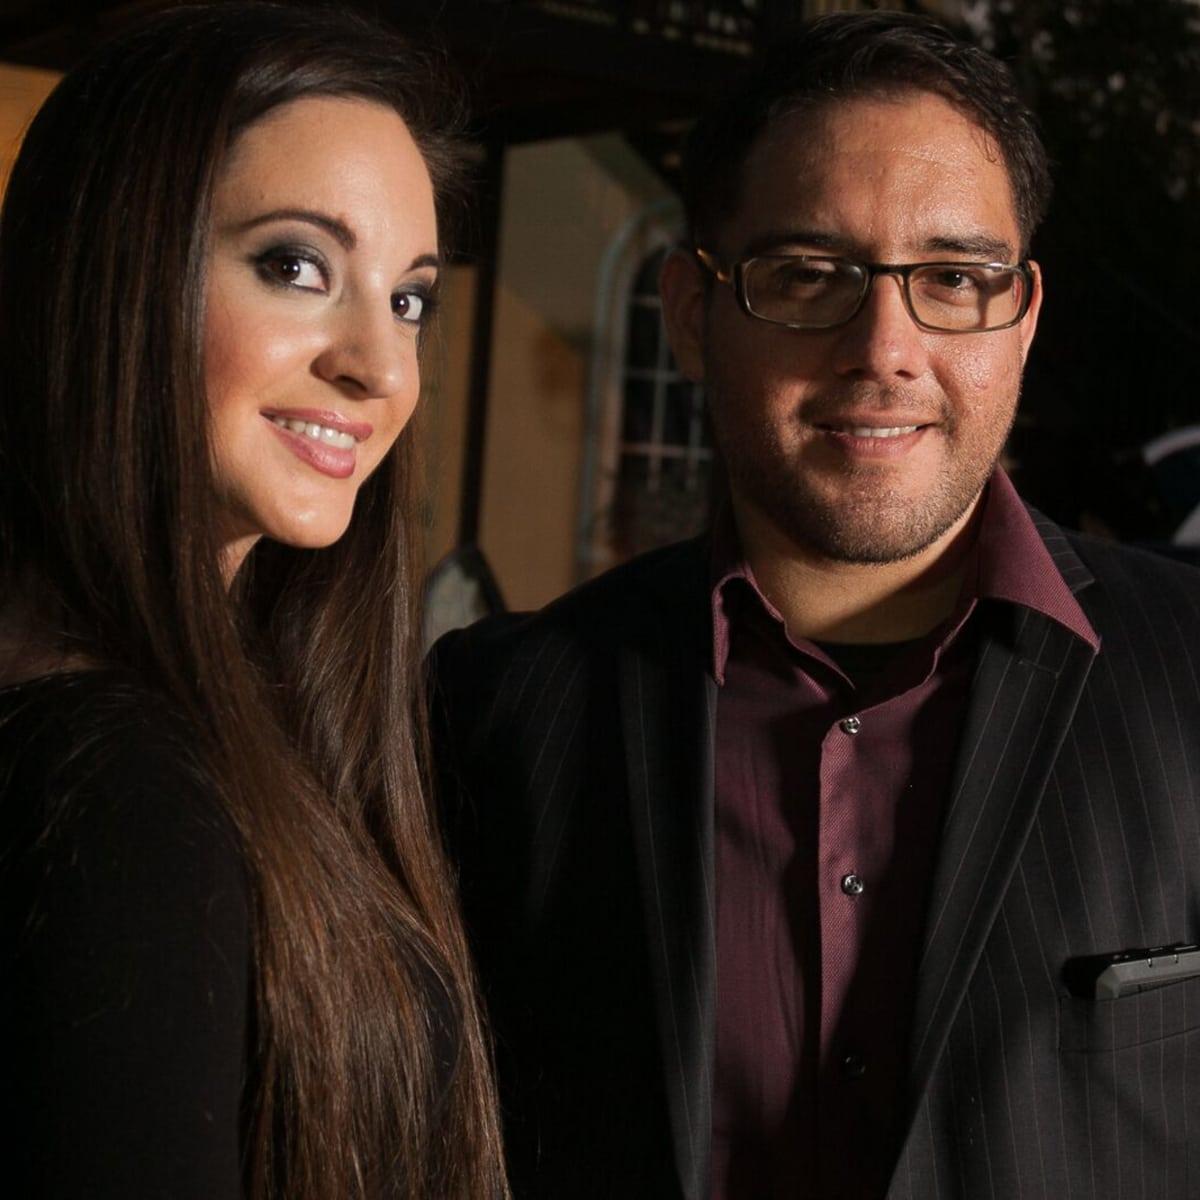 News, Shelby, CultureMap social, Aug. 215, Shelbi-Nicole, Carolos Reyes, Rebecca Walkup, Carlos Reyes